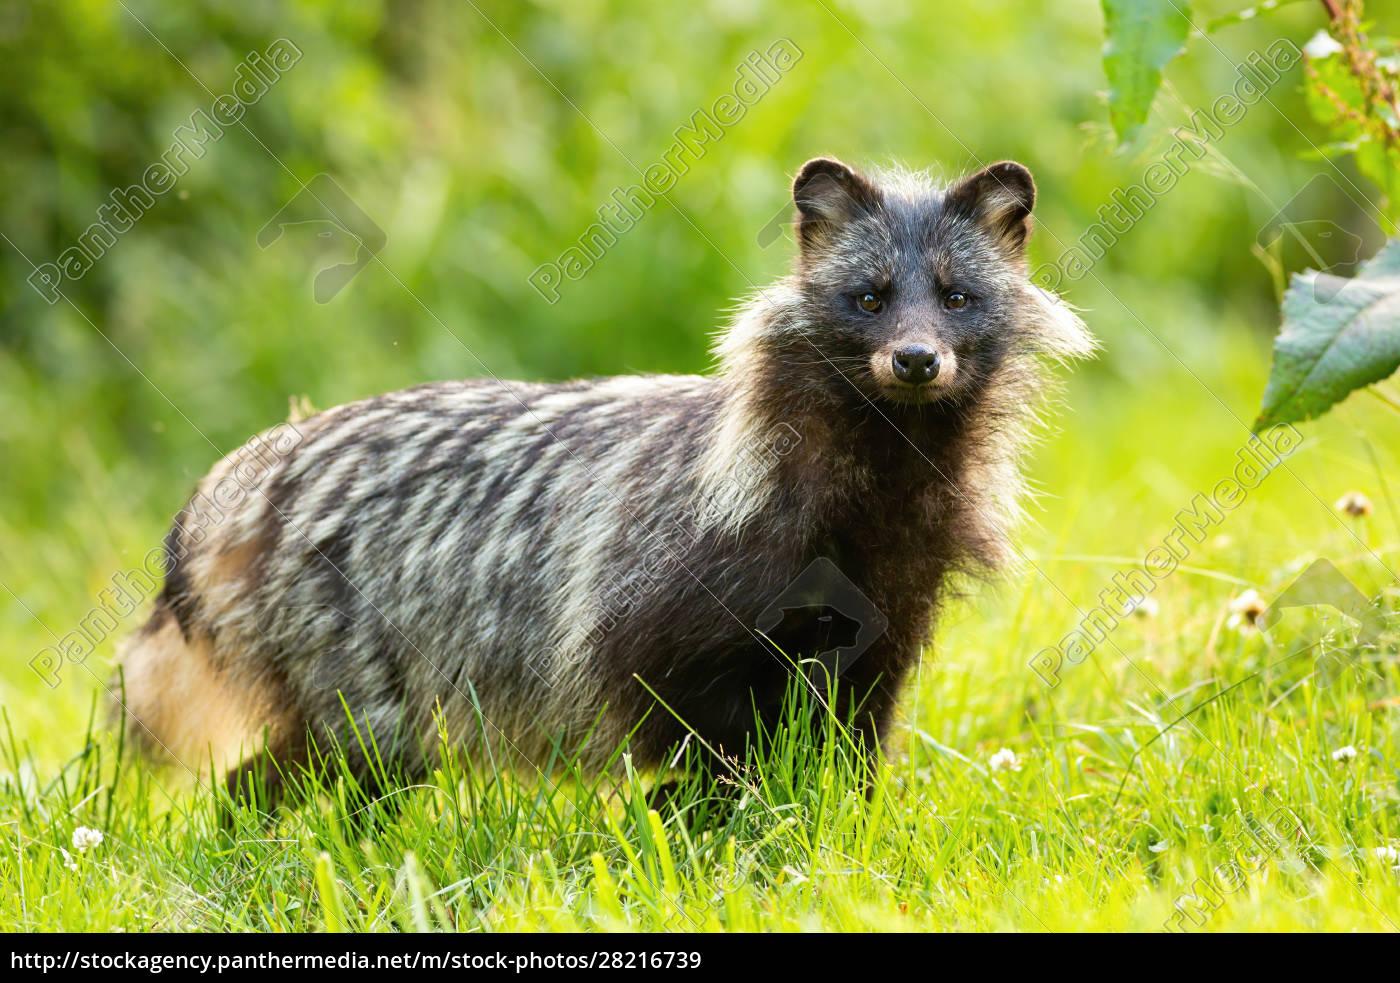 horizontal, composition, of, wild, raccoon, dog, - 28216739